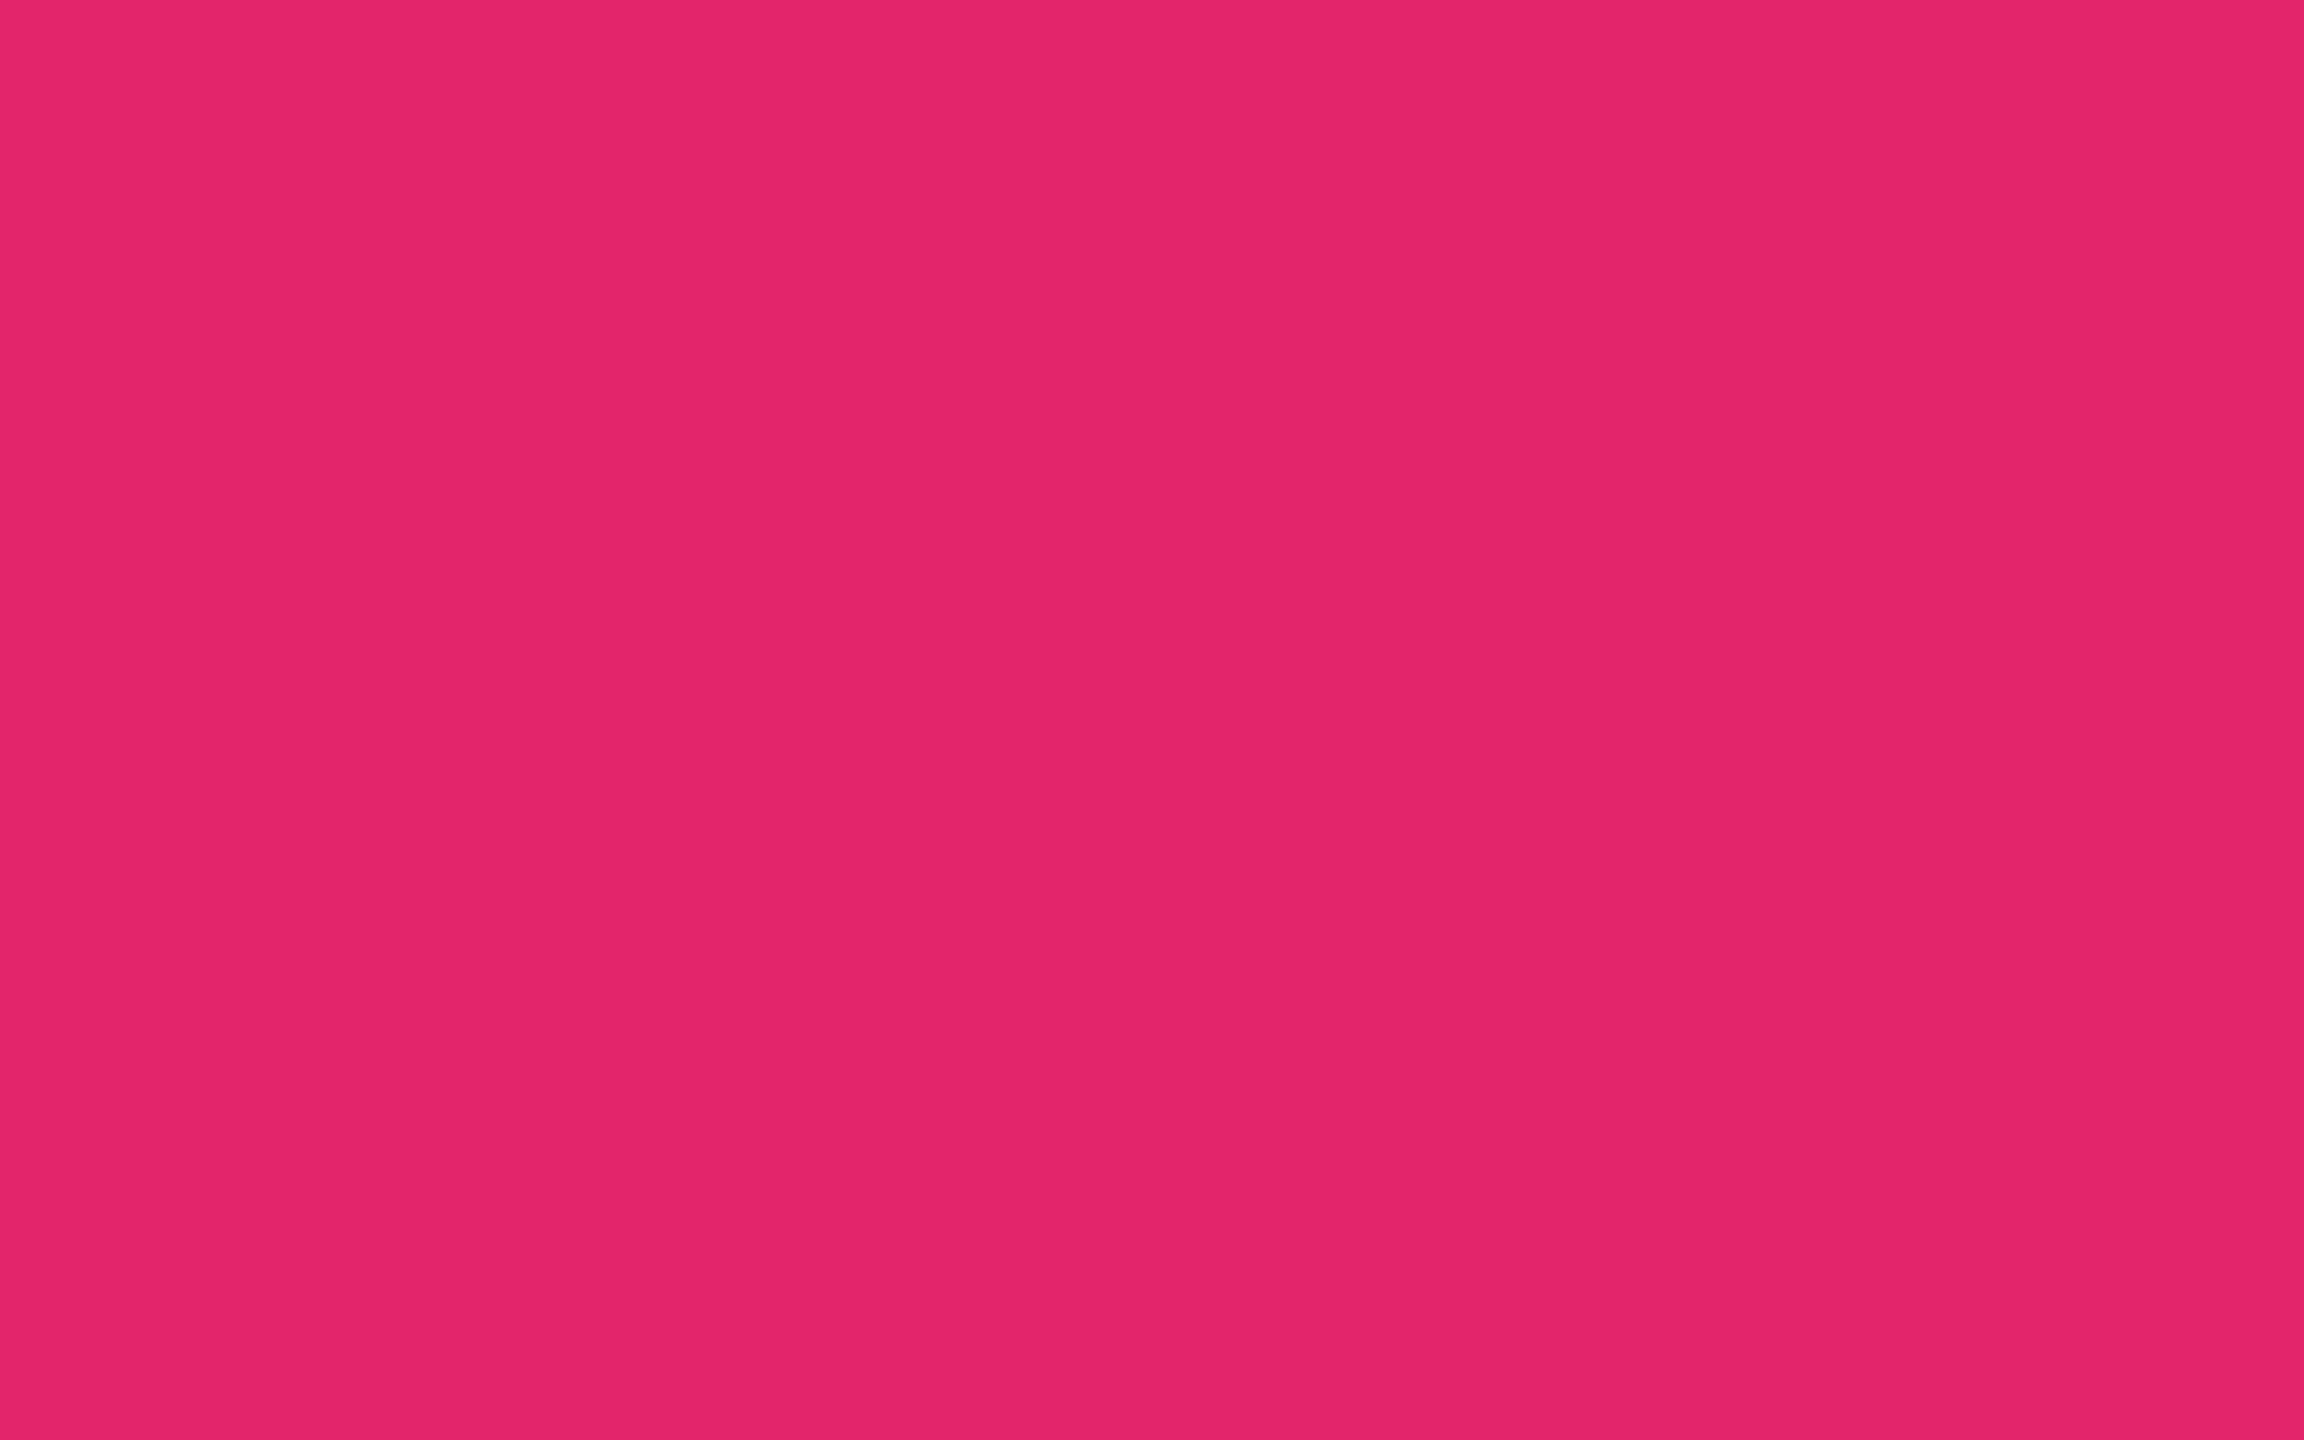 2304x1440 Razzmatazz Solid Color Background